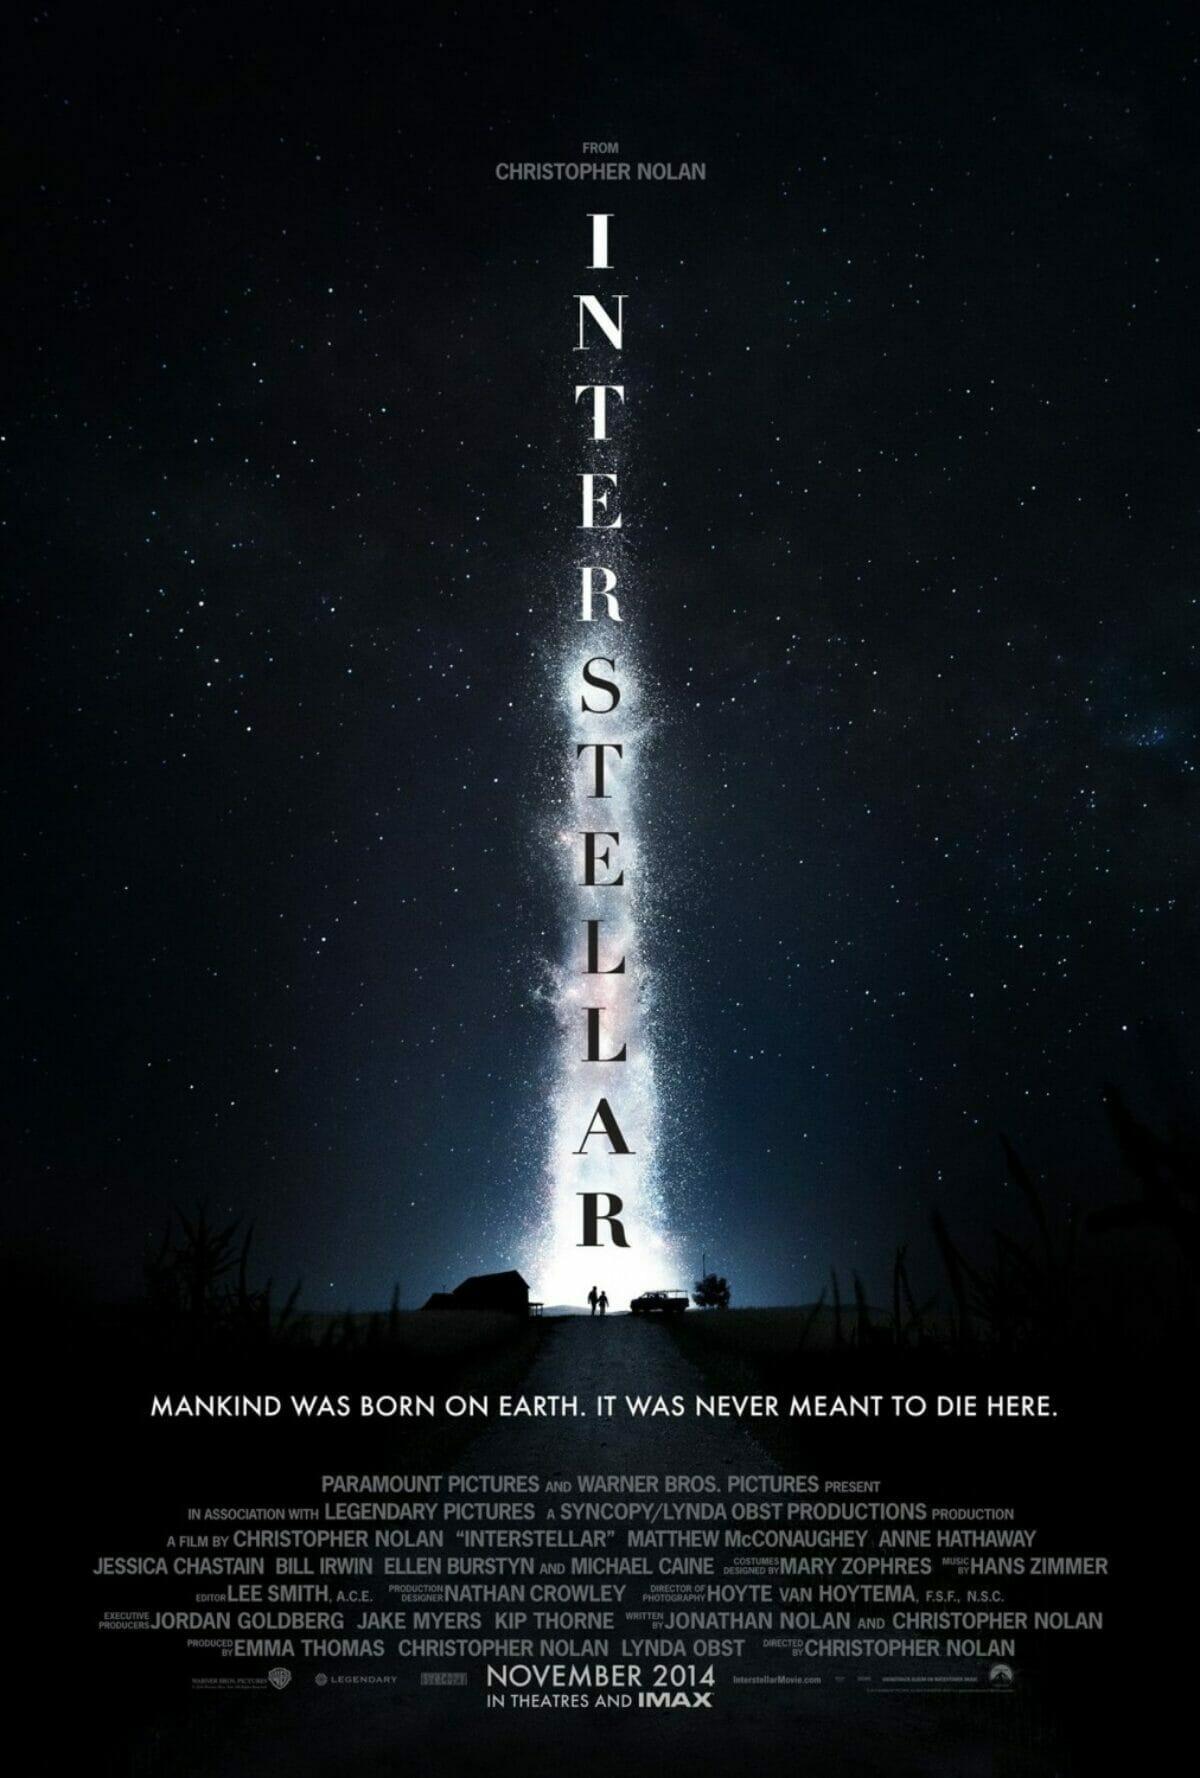 interstellar-poster-christopher-nolan